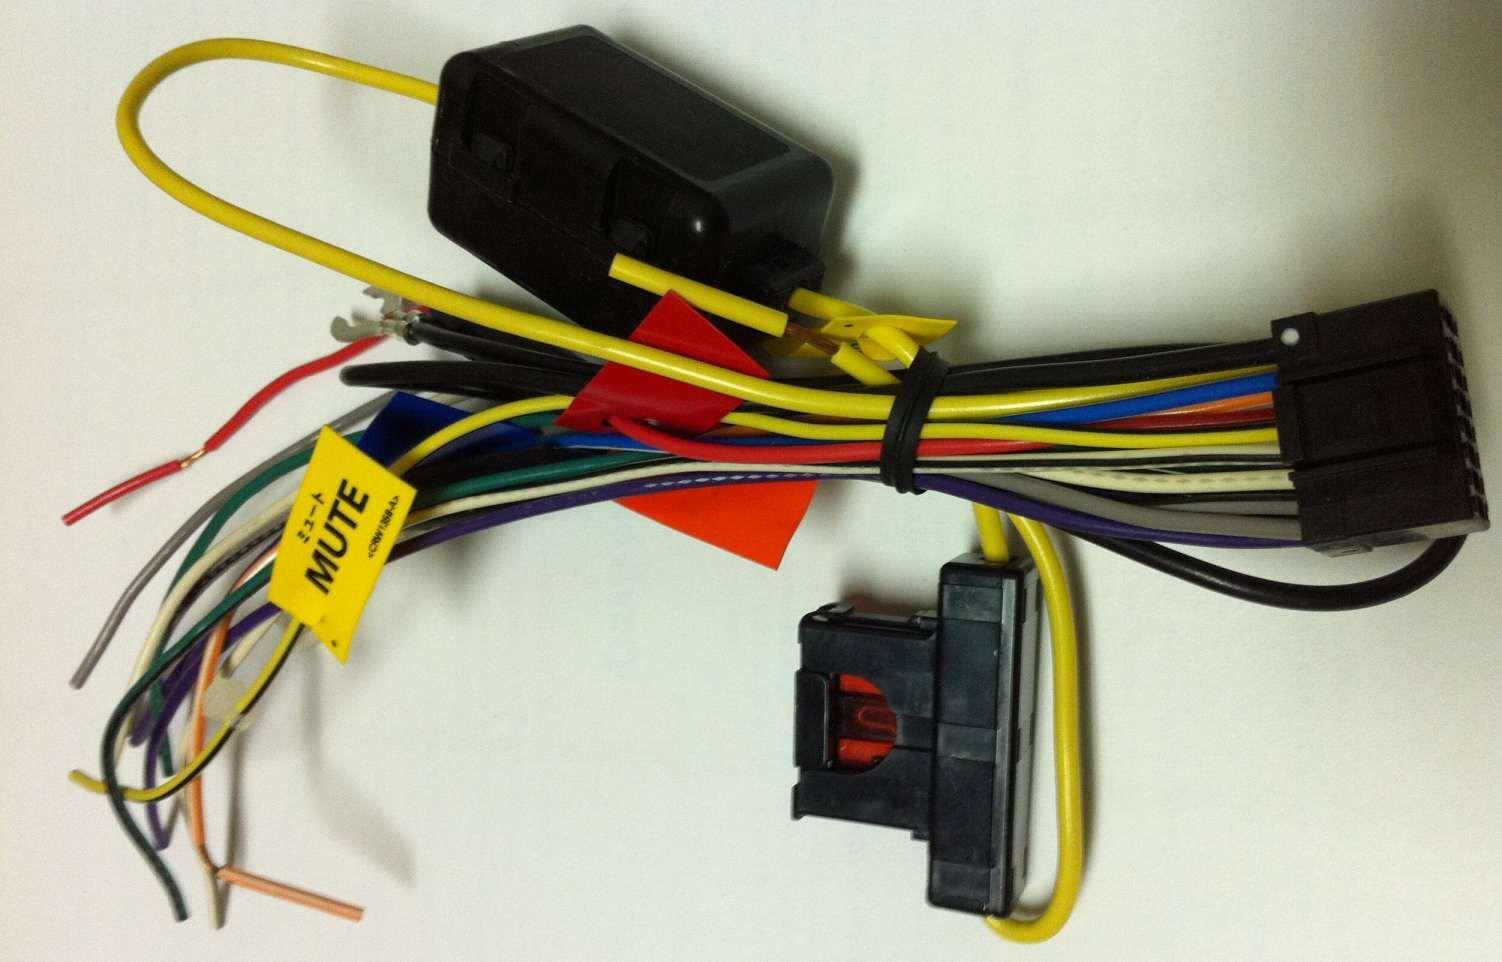 Pioneer Car Stereo Wiring Diagram And Car Audio Wiring Pioneer Deh Pbt Engineer Wiring Diagram Pioneer Car Stereo Bluetooth Car Stereo Car Stereo Speakers